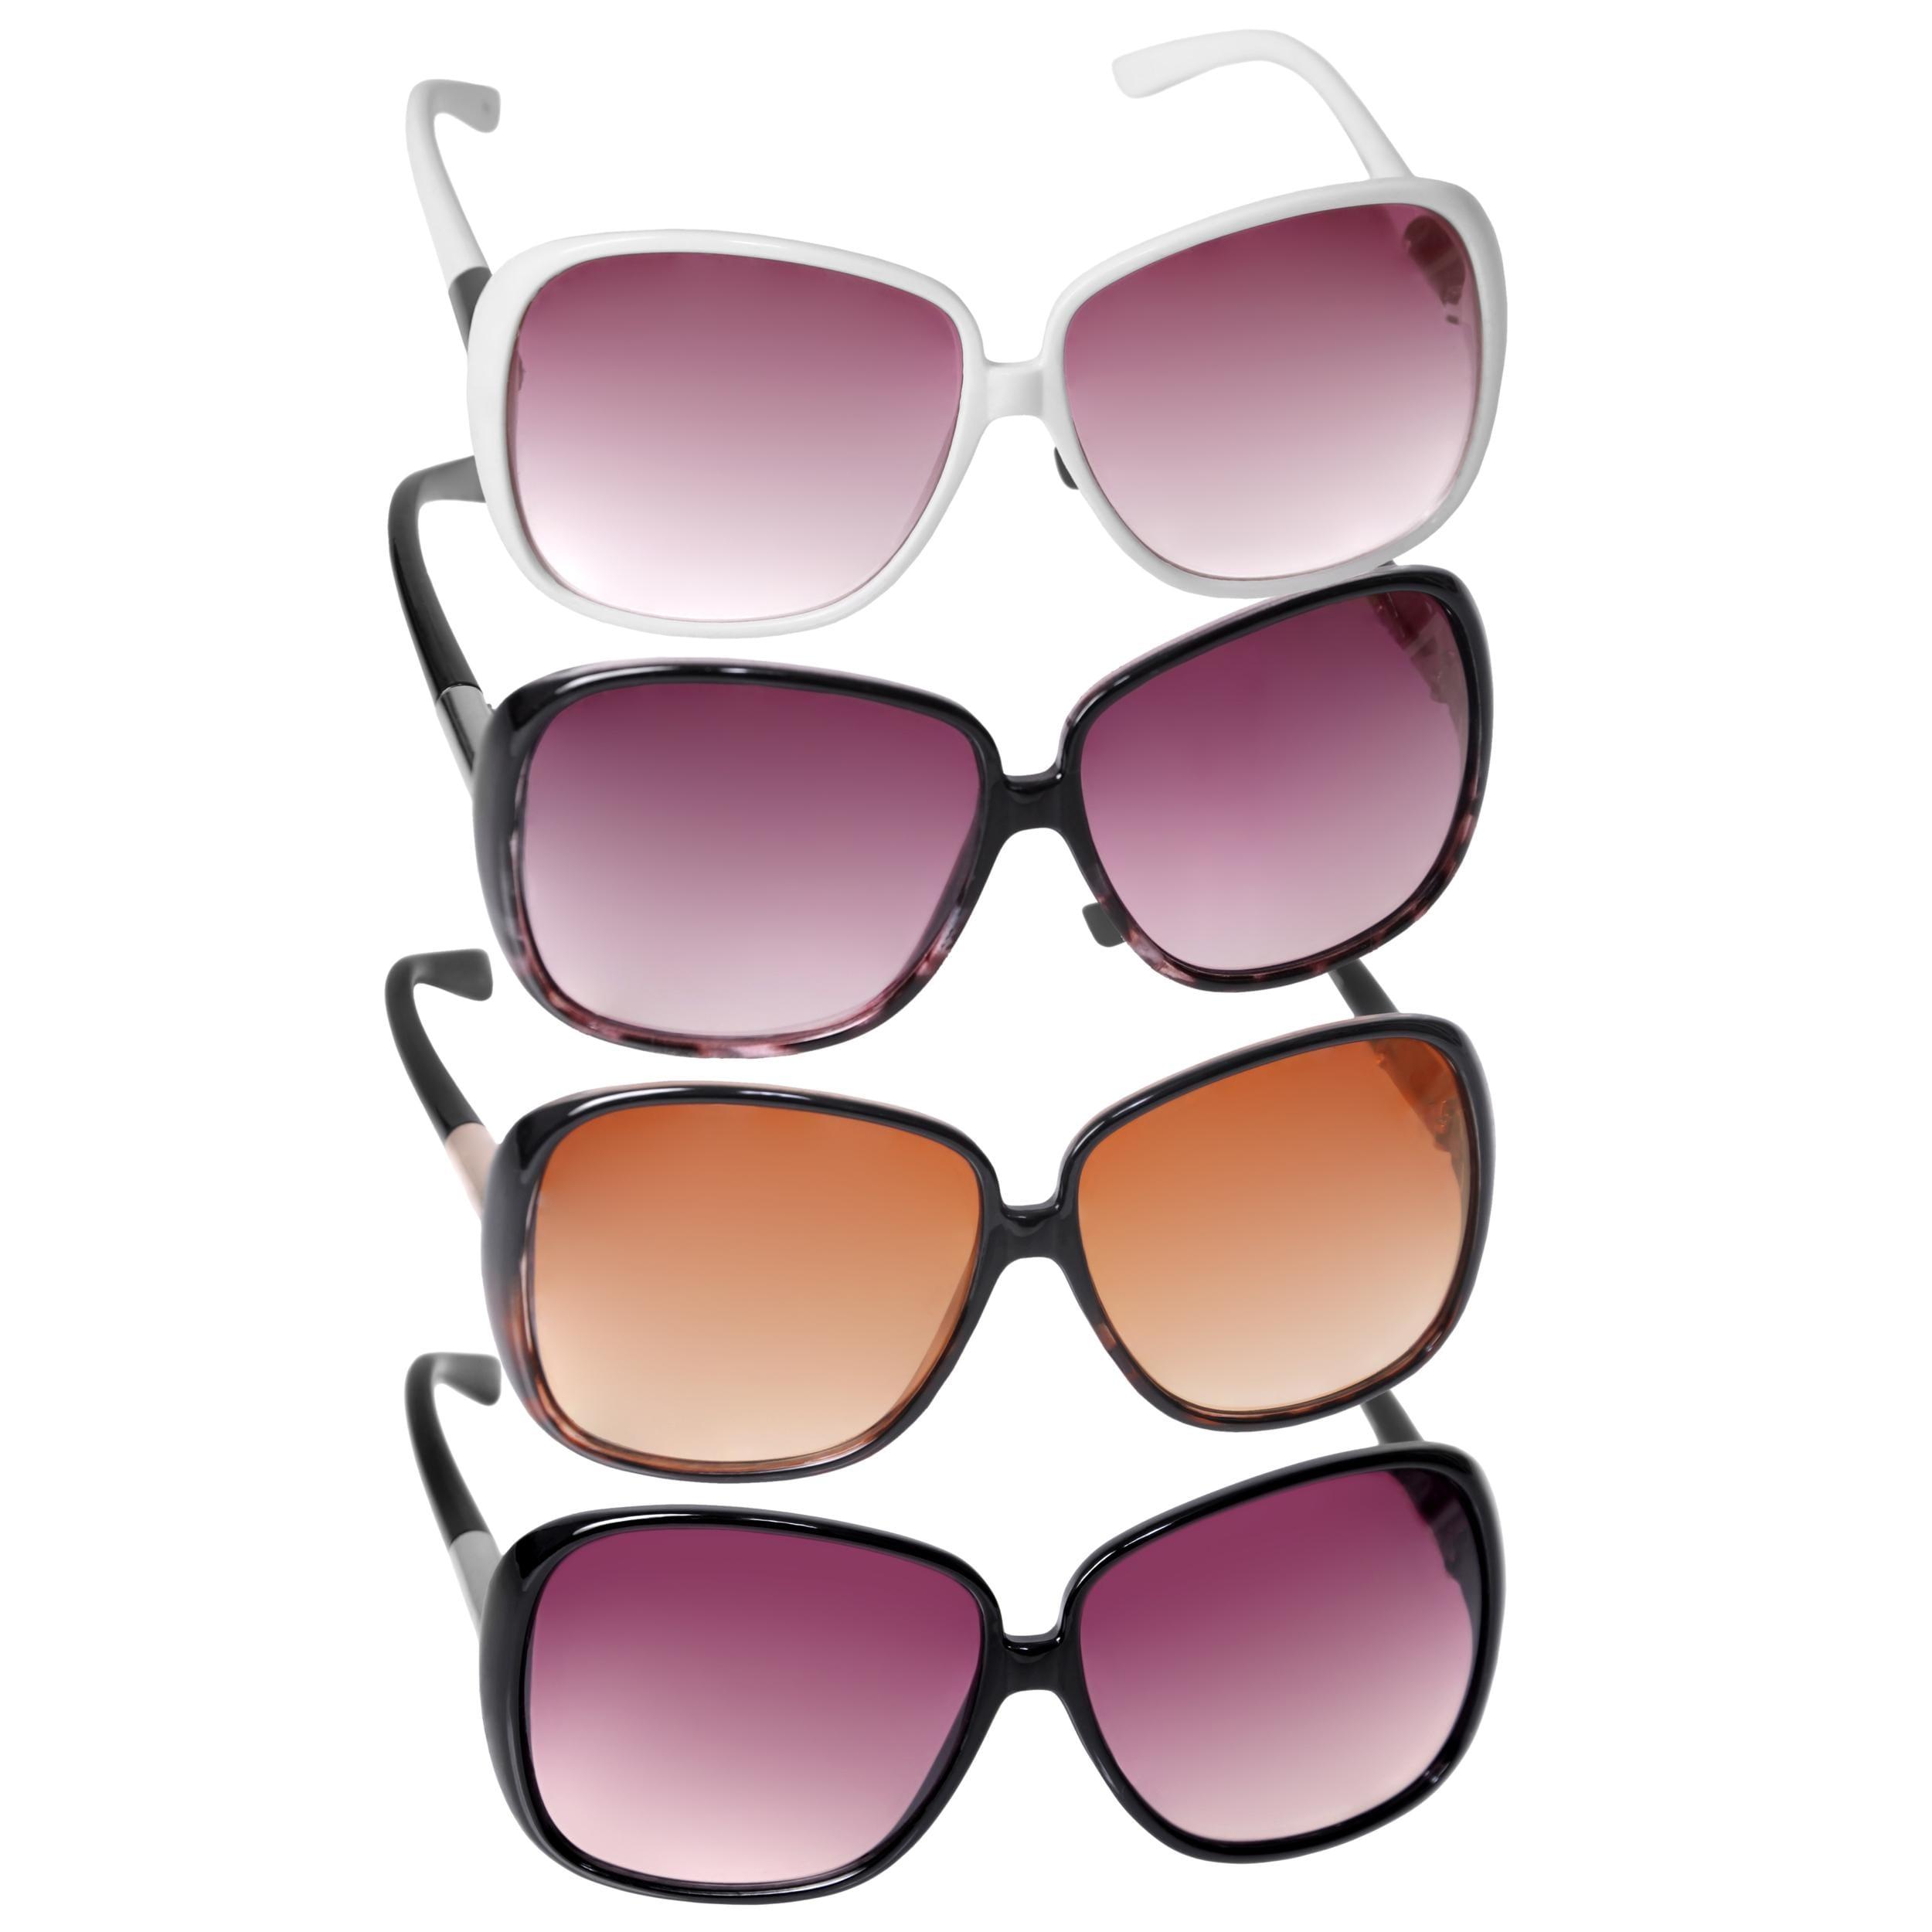 Adi Designs Women's Oversized Sunglasses Model CE10358